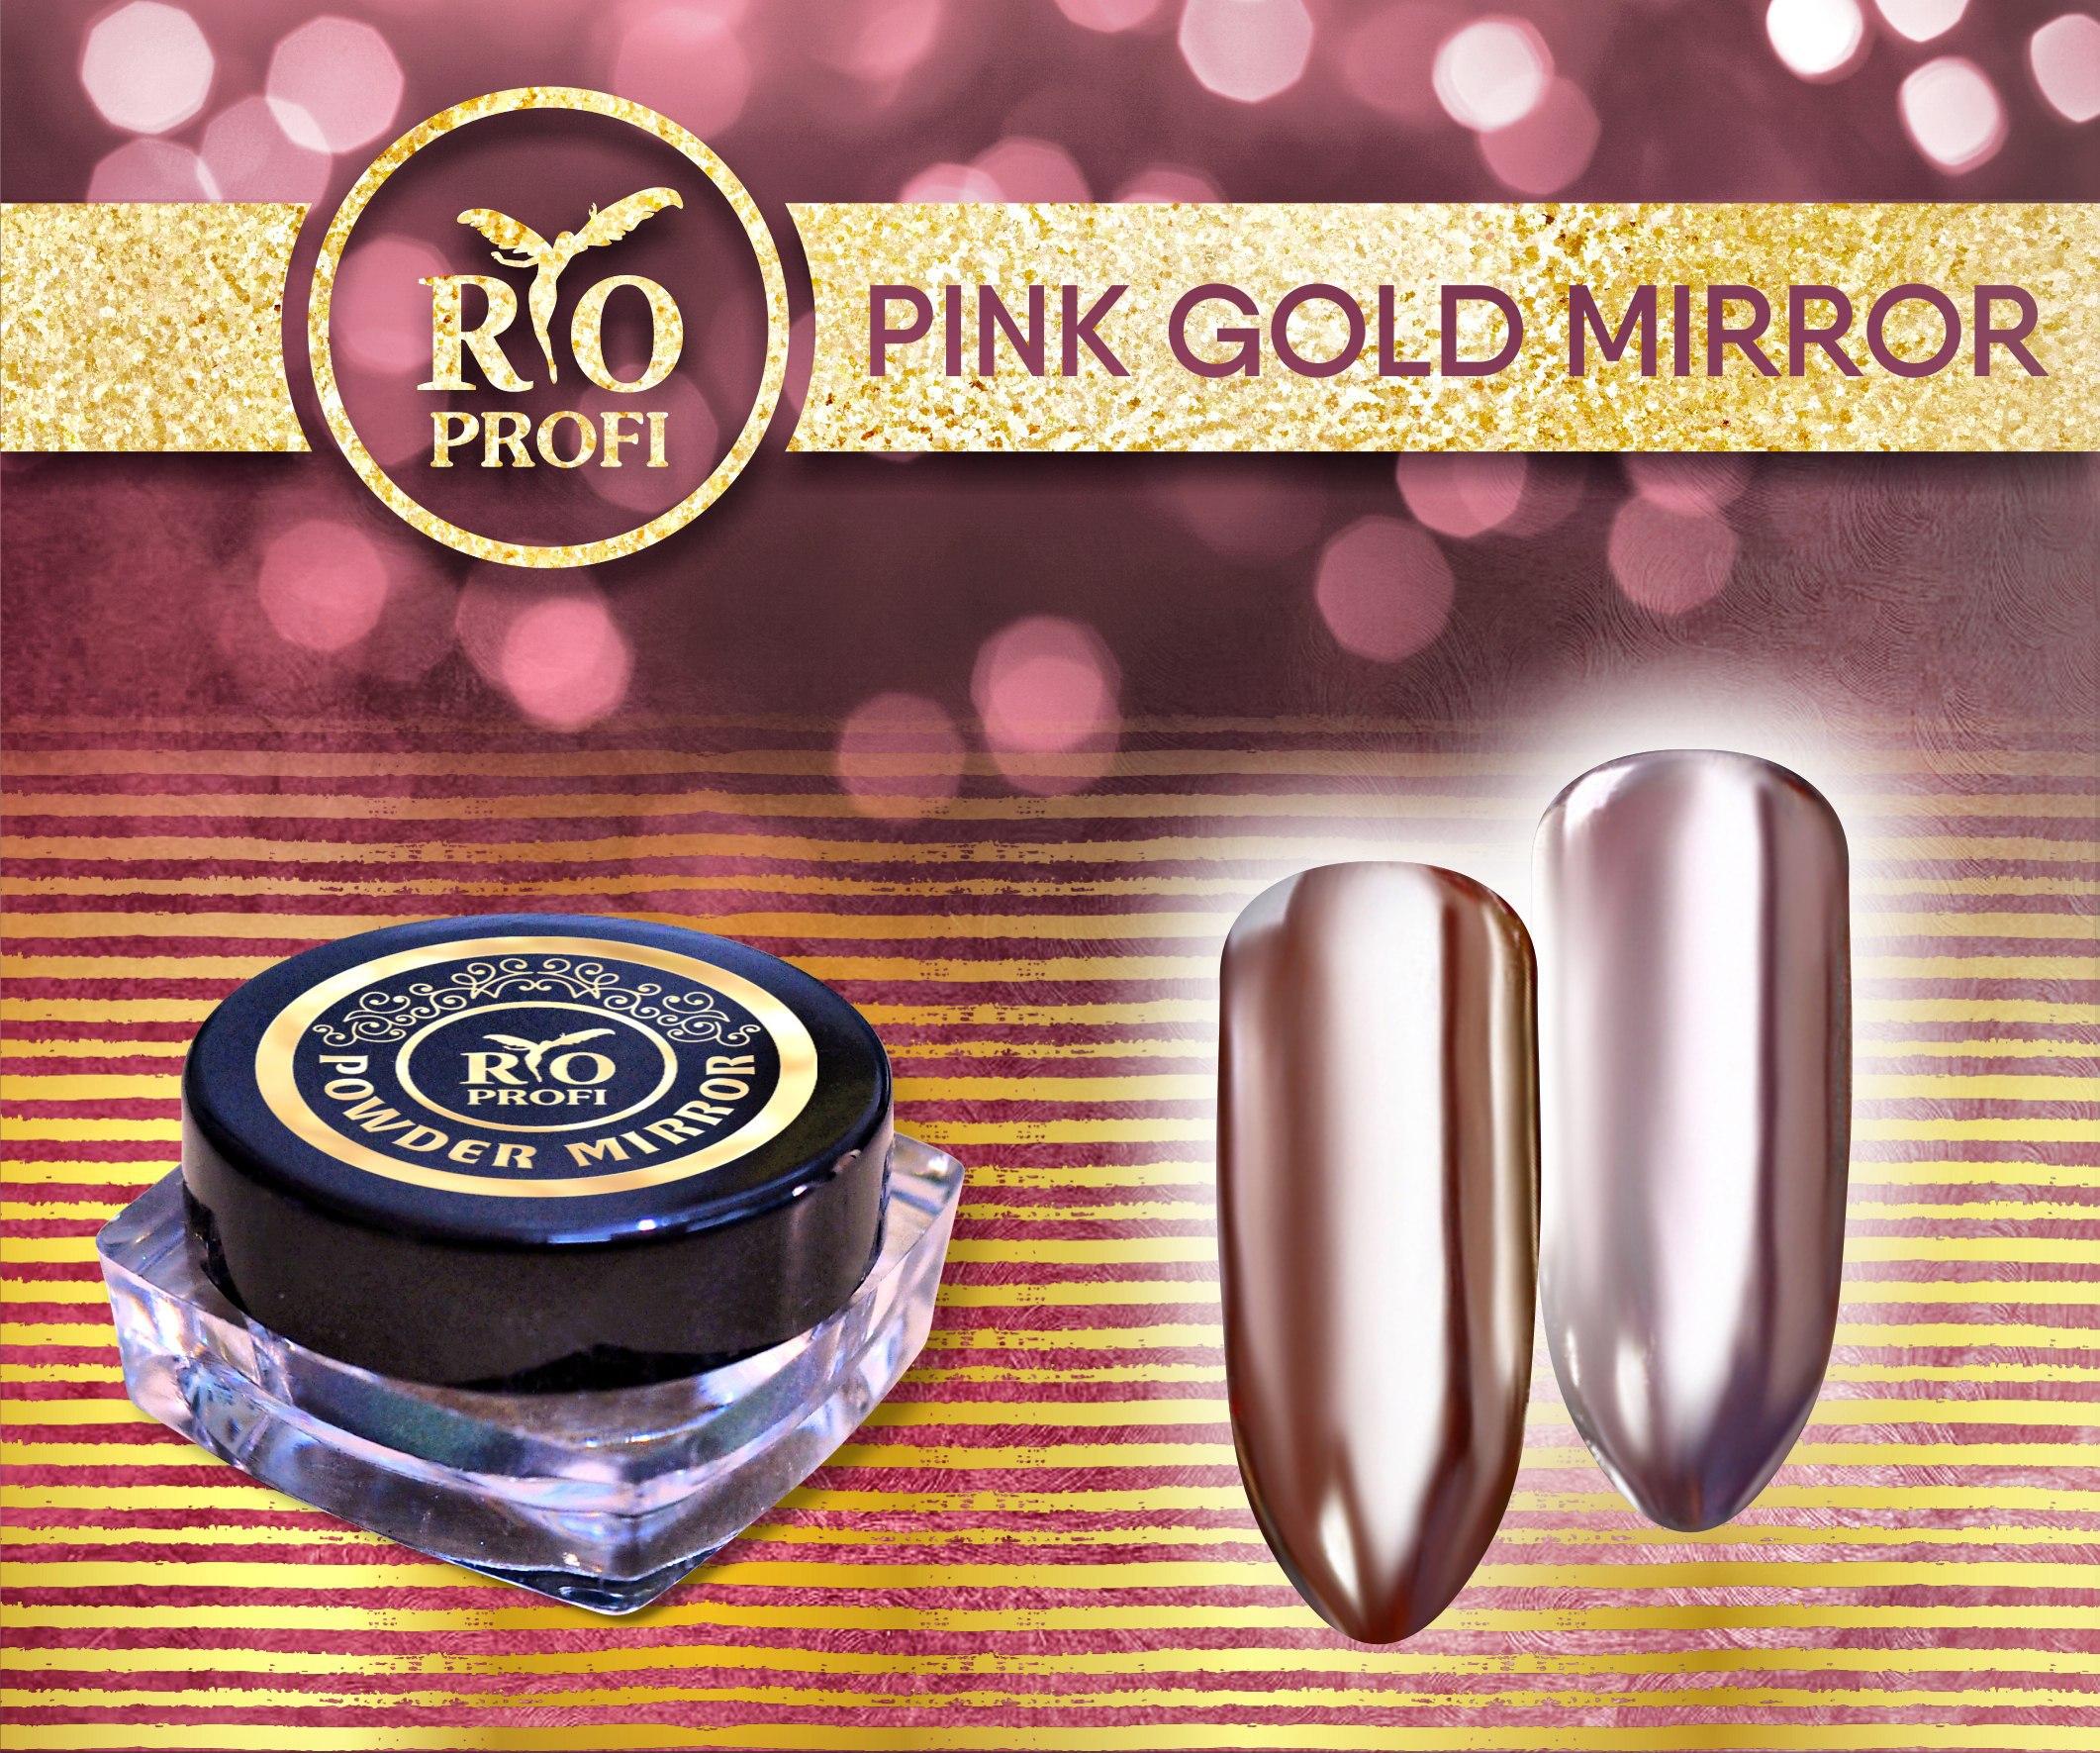 Rio Profi, зеркальная пудра, розовое золото